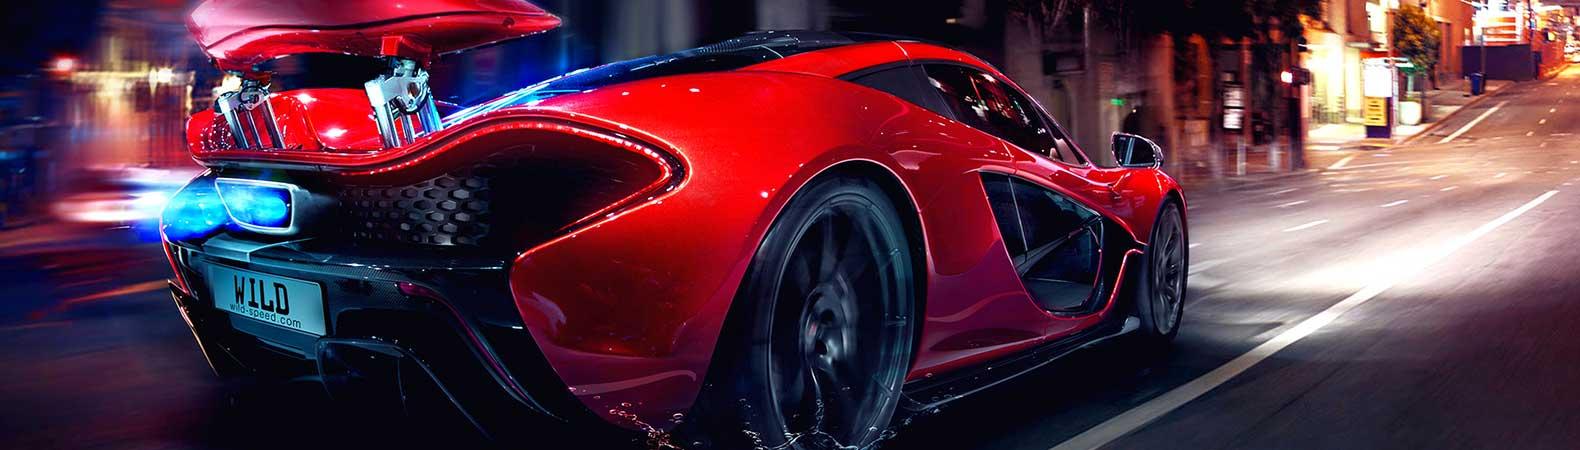 simulation voiture course